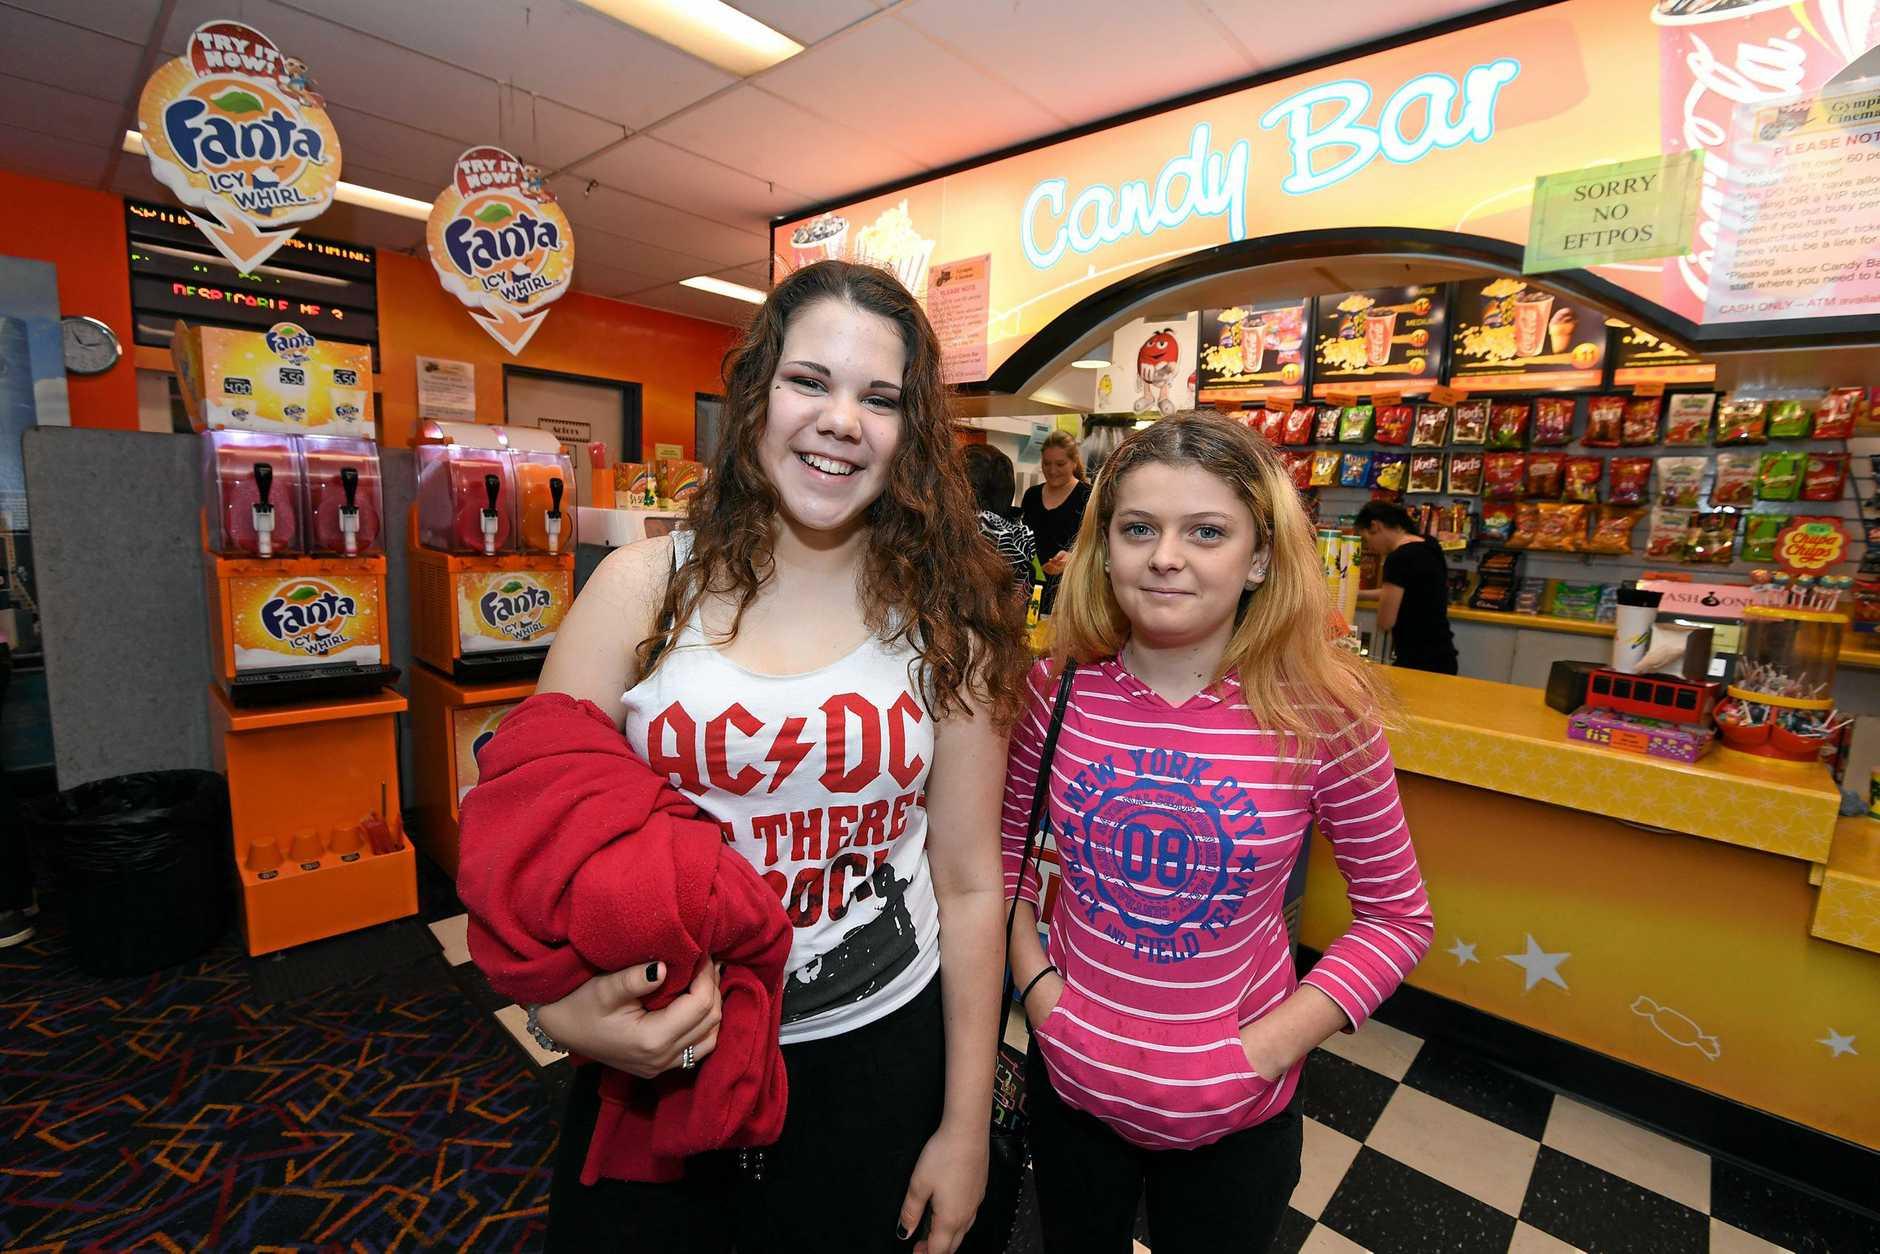 Take in a movie at Gympie Cinemas like Ashley Woo and Amelia Smith.